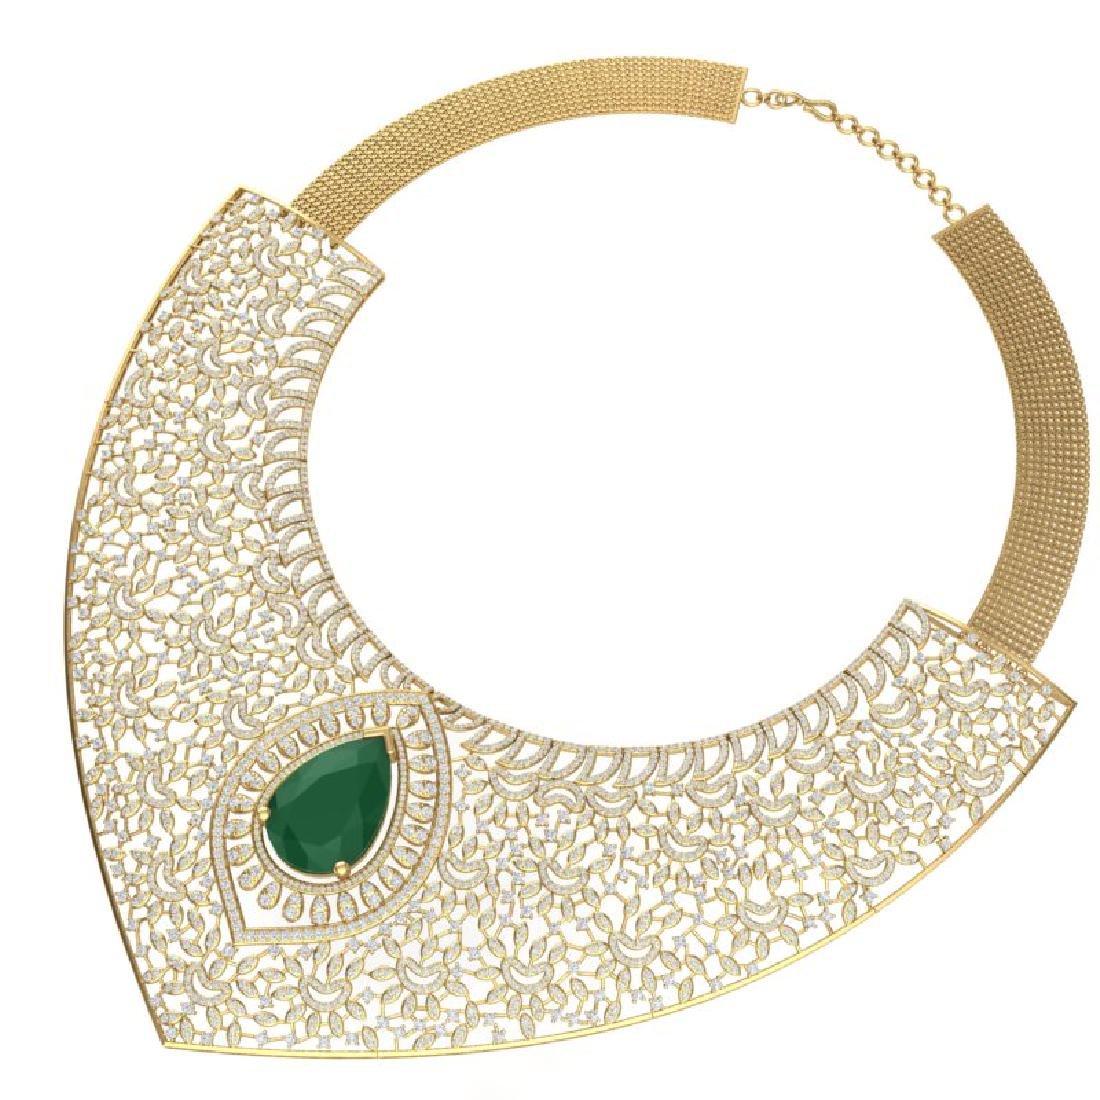 63.93 CTW Royalty Emerald & VS Diamond Necklace 18K - 3